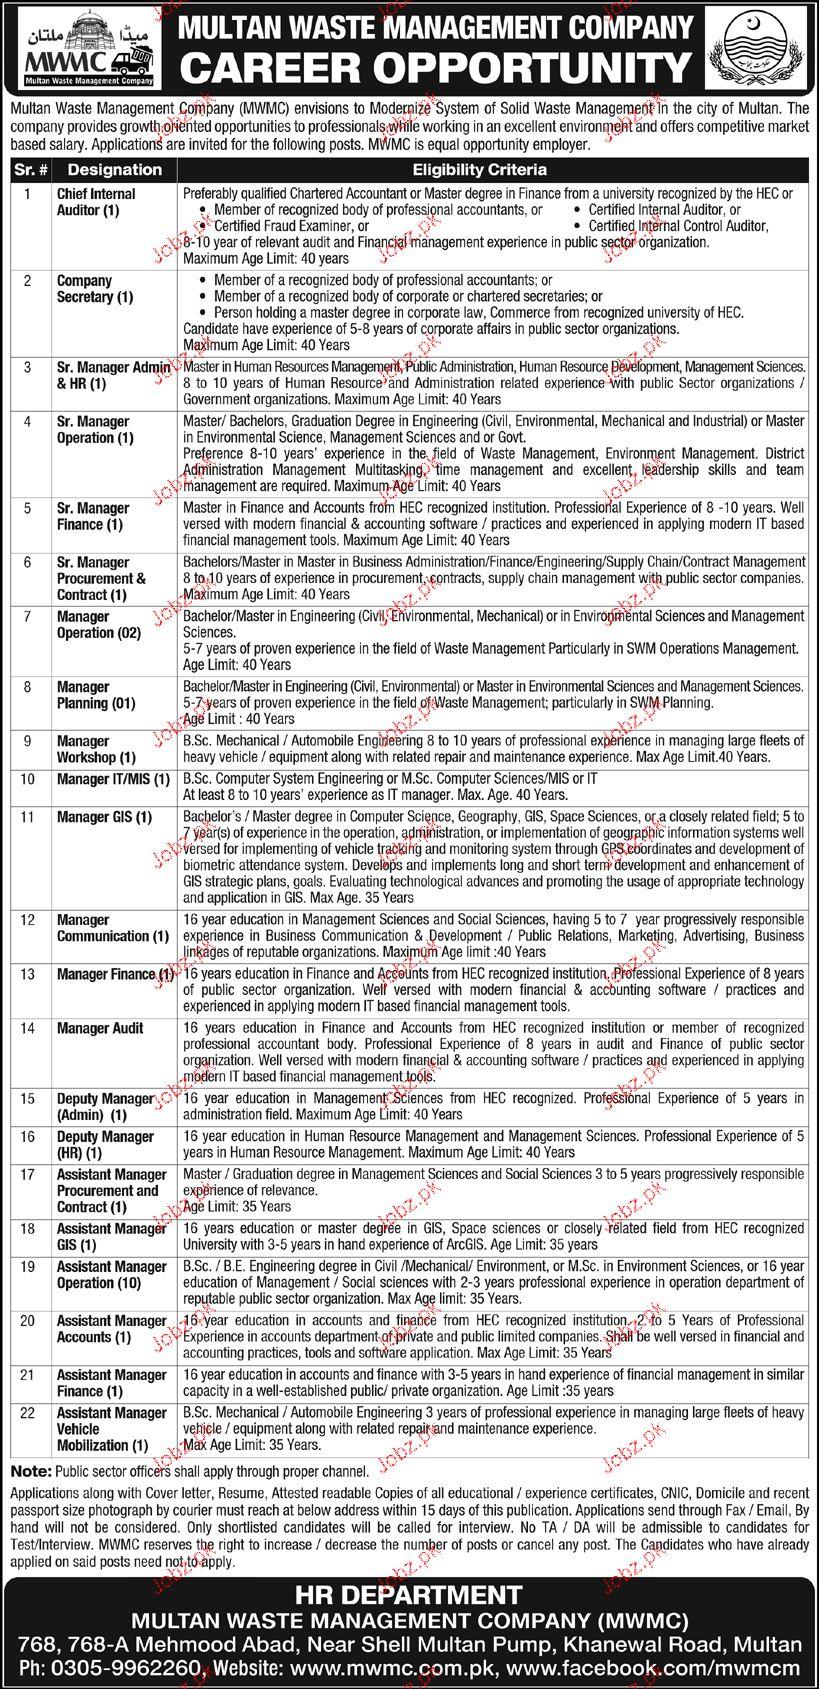 Multan Waste Management Company MWMC Jobs Open